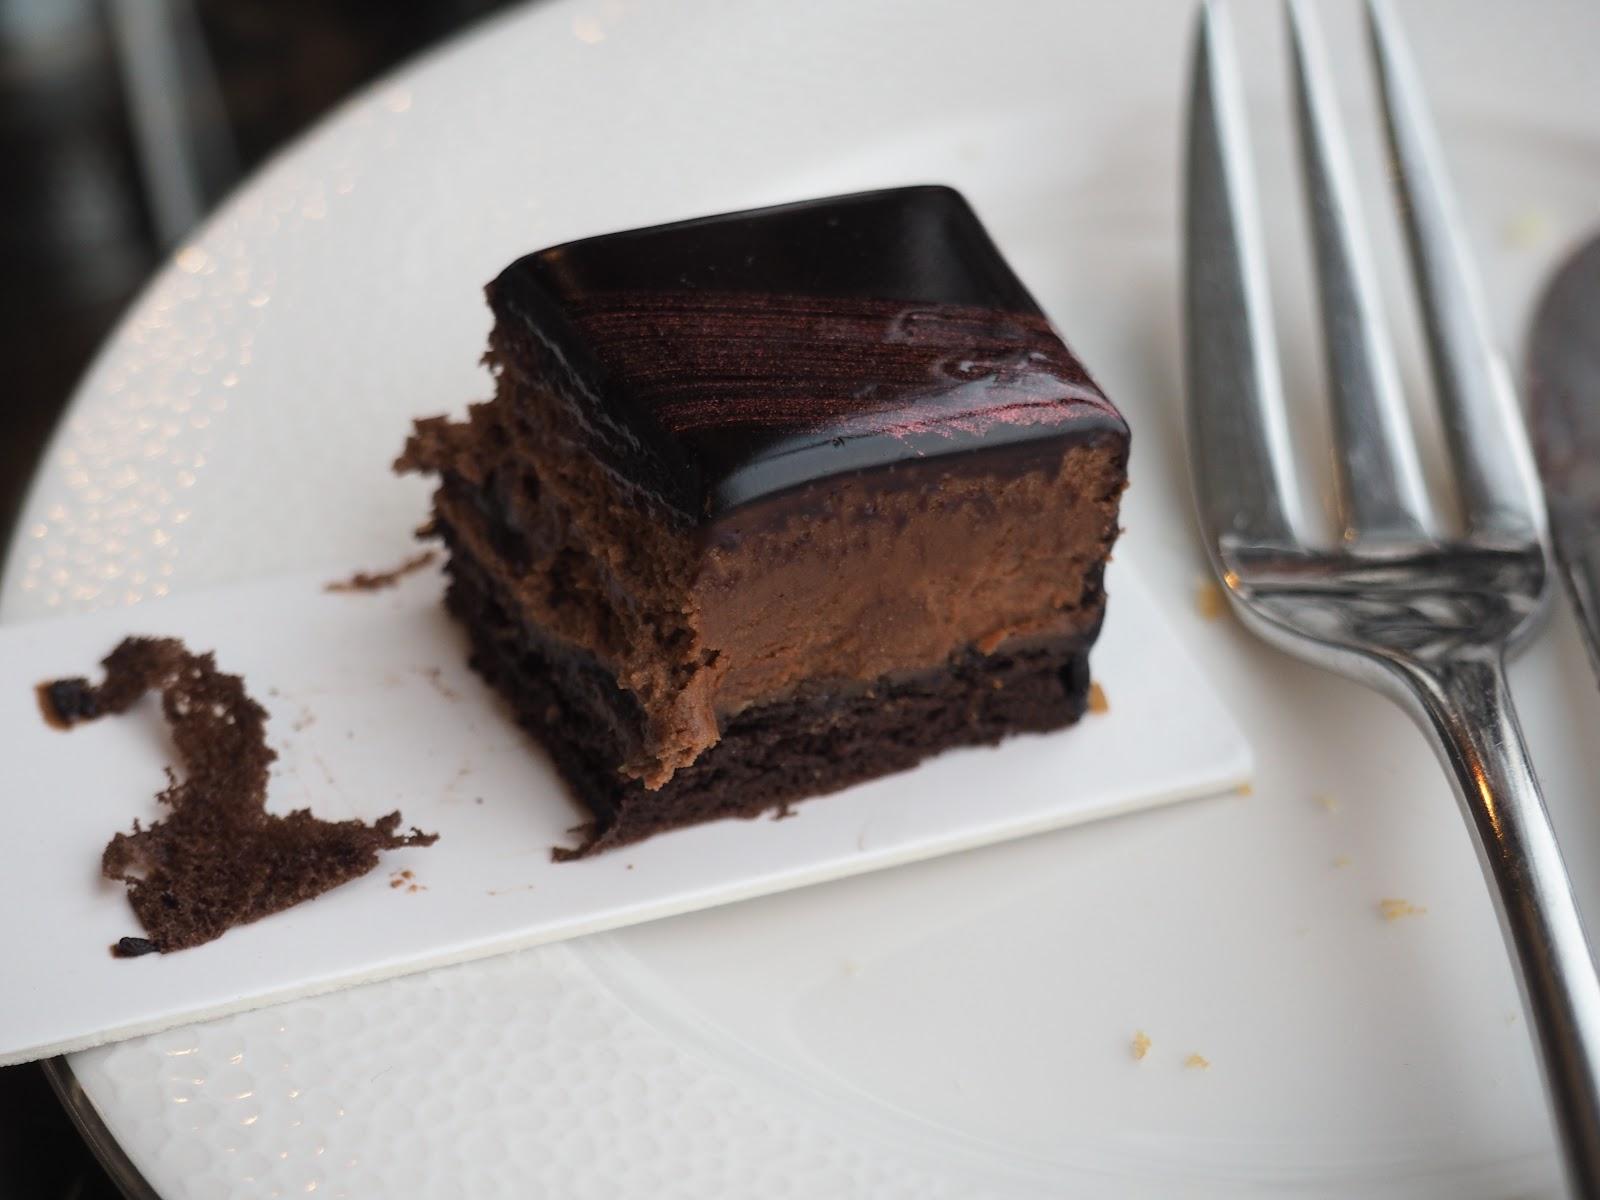 chocolate cake from Afternoon Tea at GONG Bar at the Shangri La at The Shard